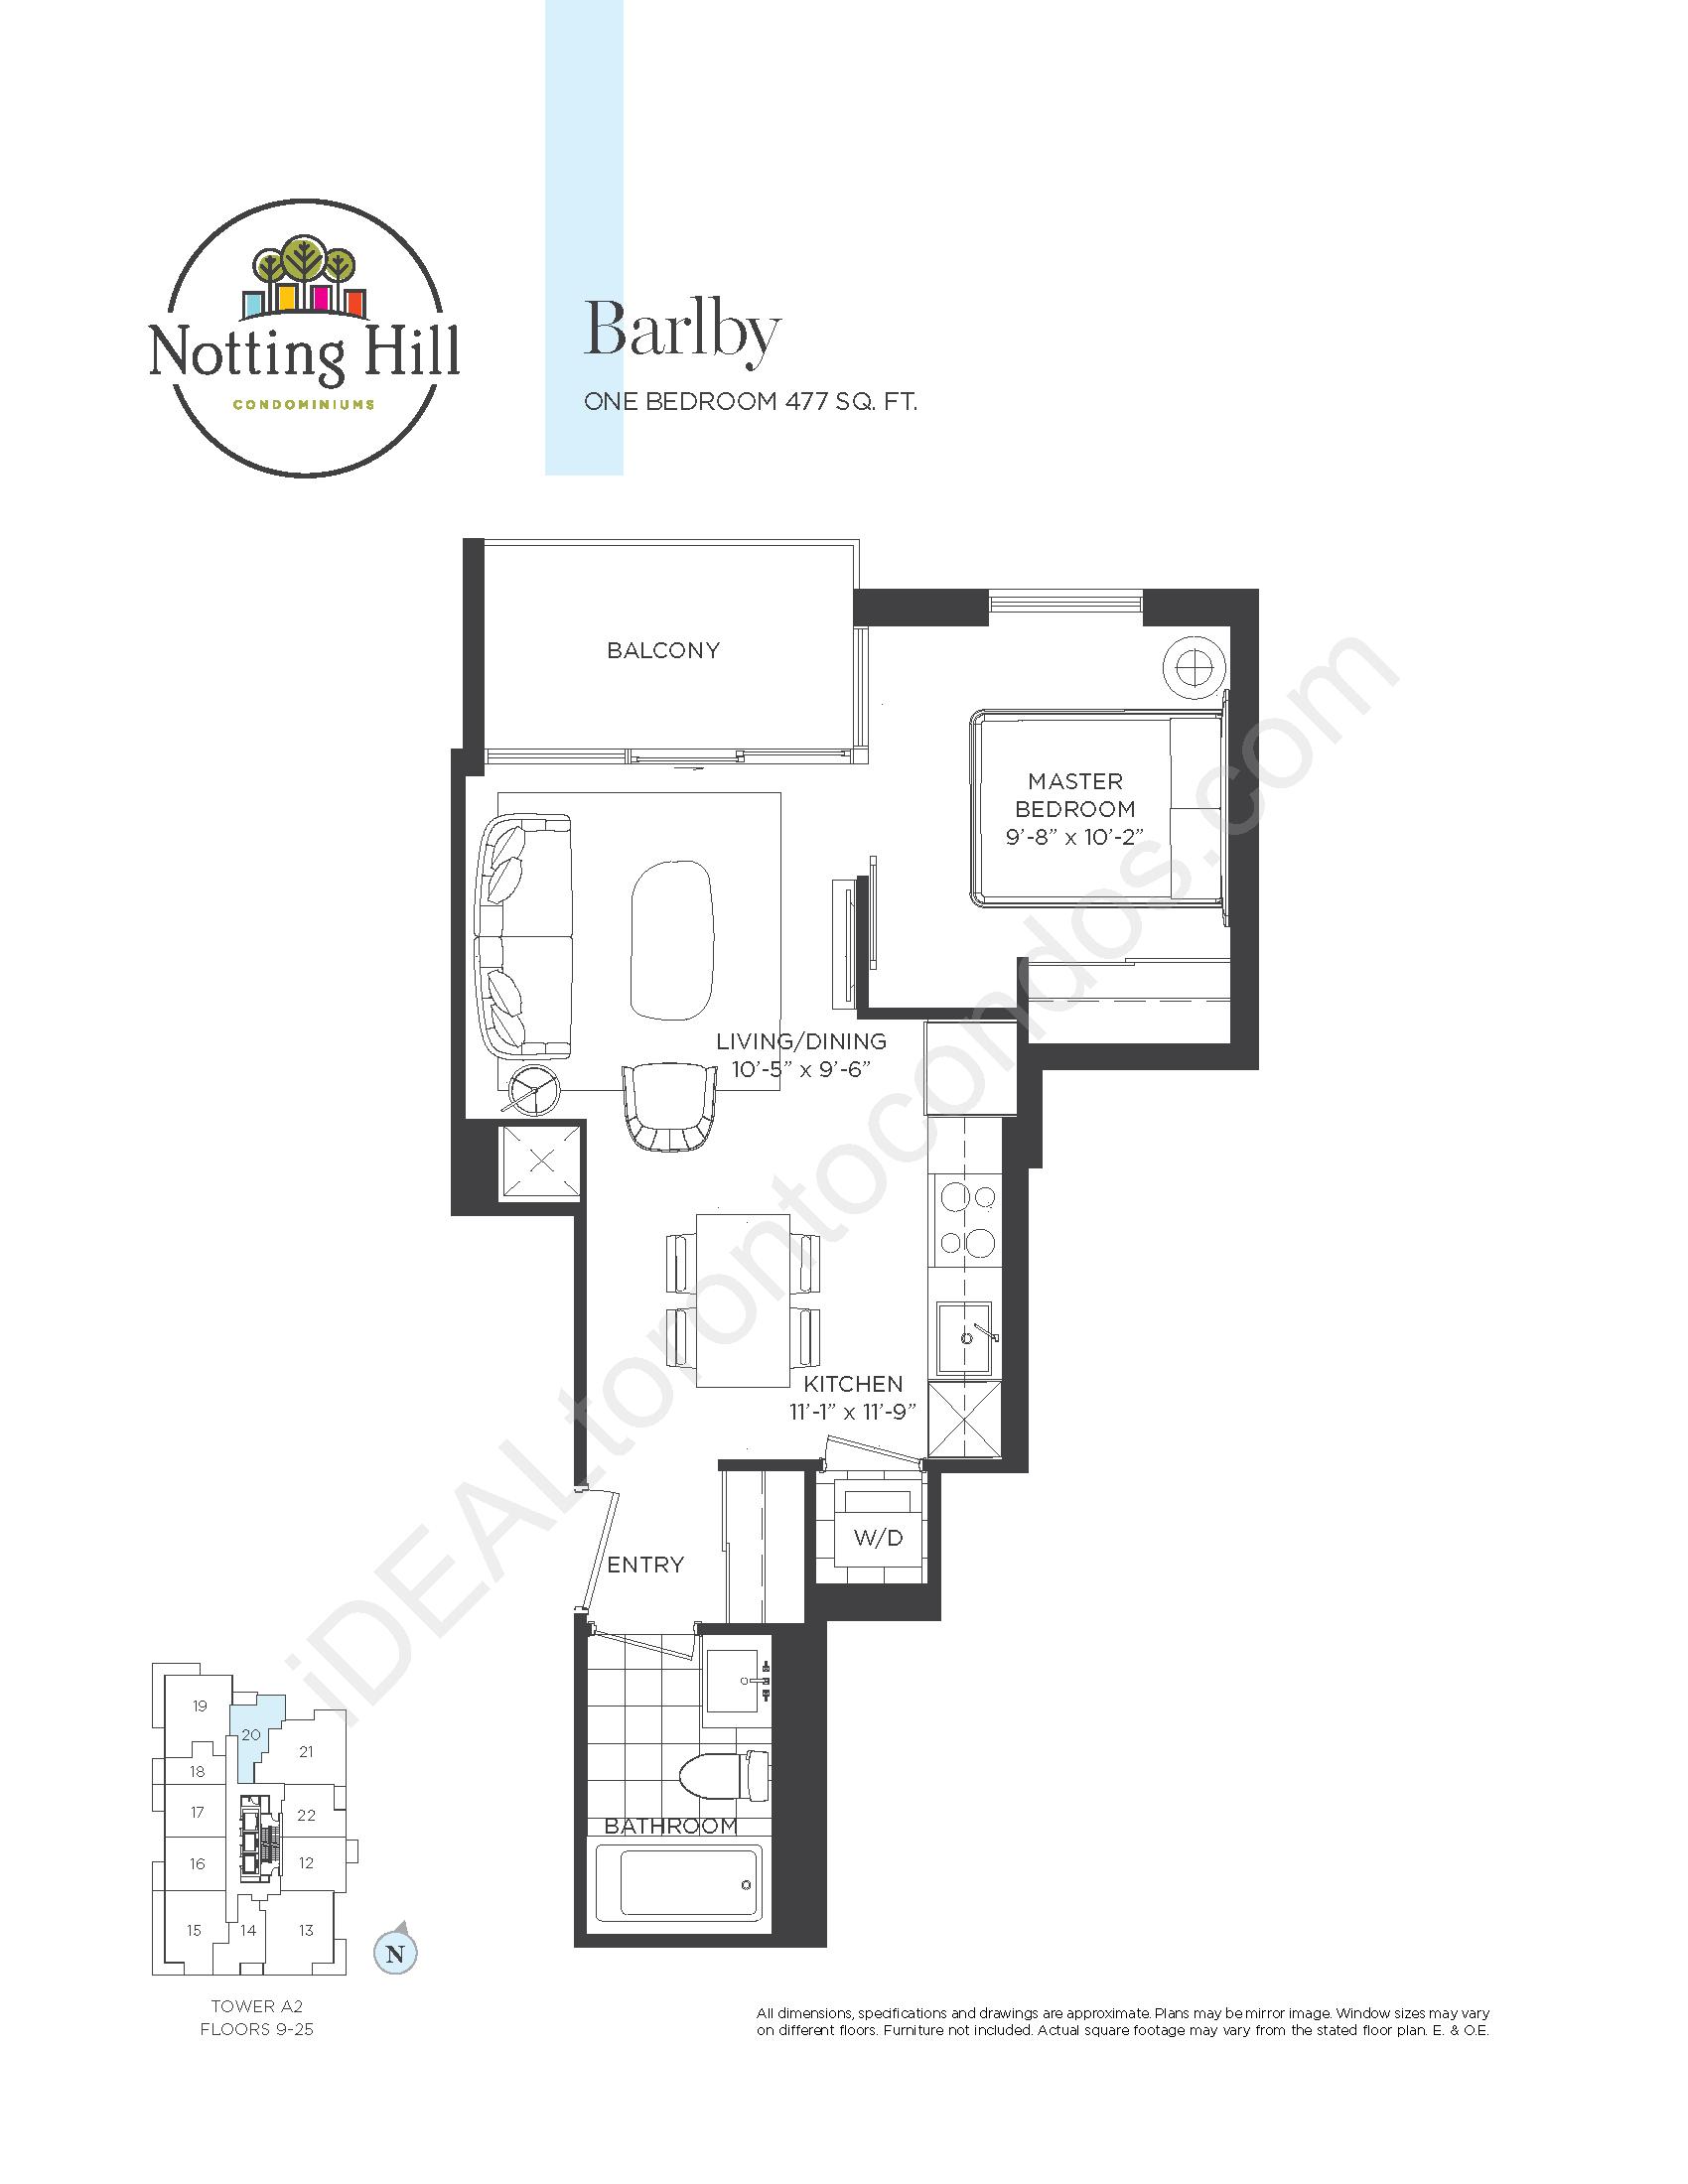 Barlby - One bedroom